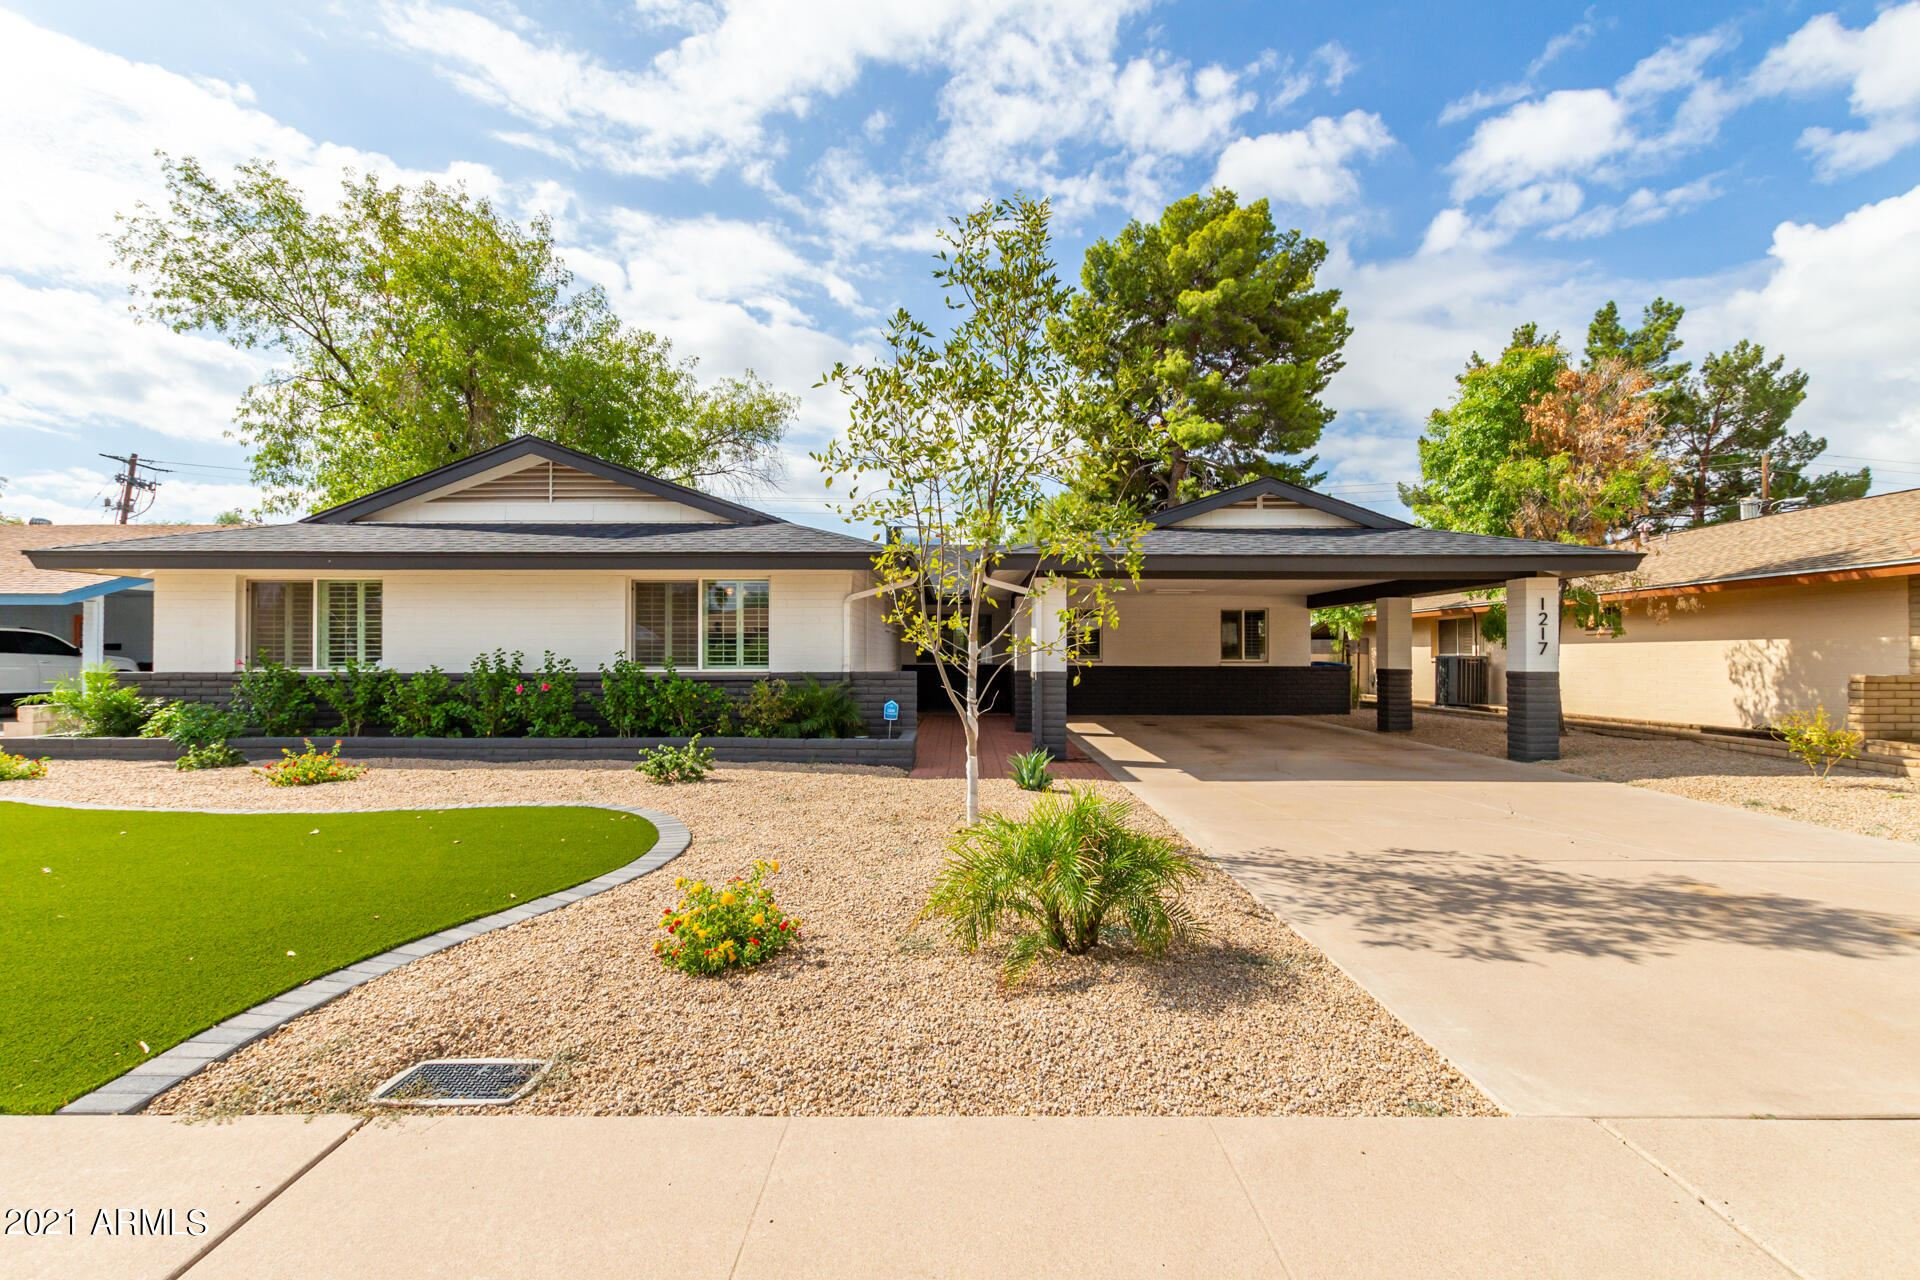 1217 E FAIRMONT Drive, Tempe, AZ 85282 - MLS#: 6288380